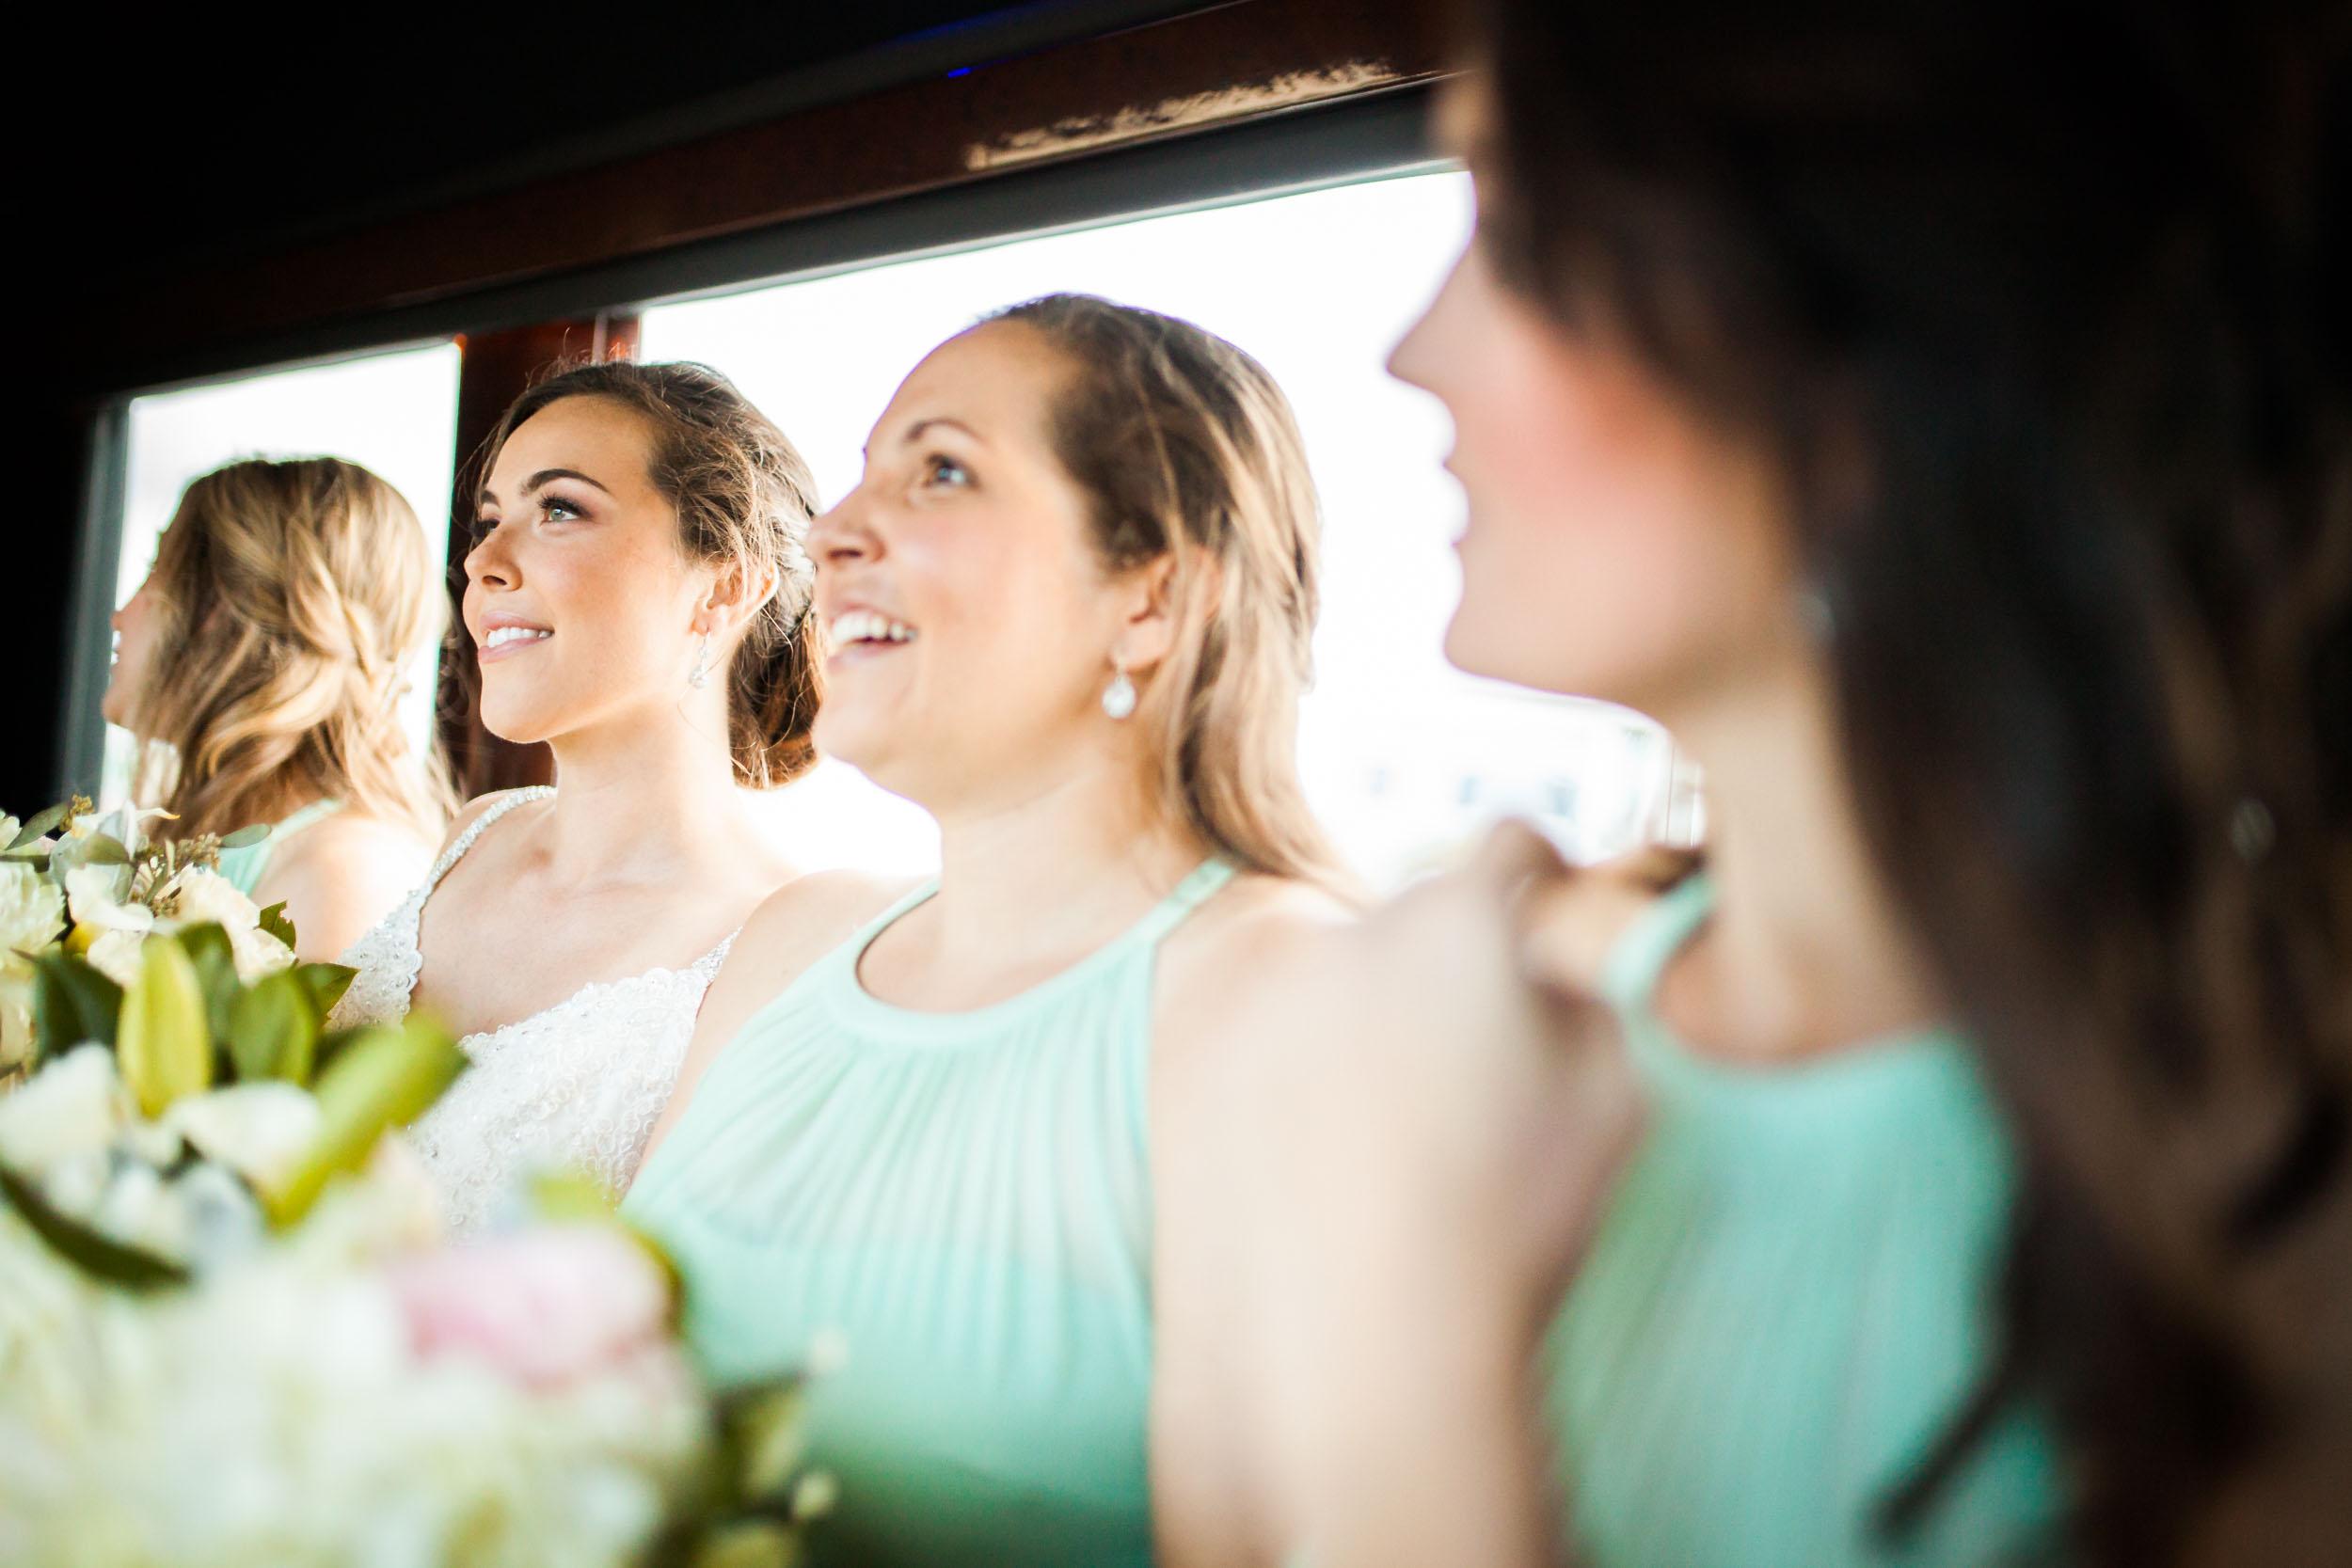 Flordia-Wedding-Photography-39.jpg